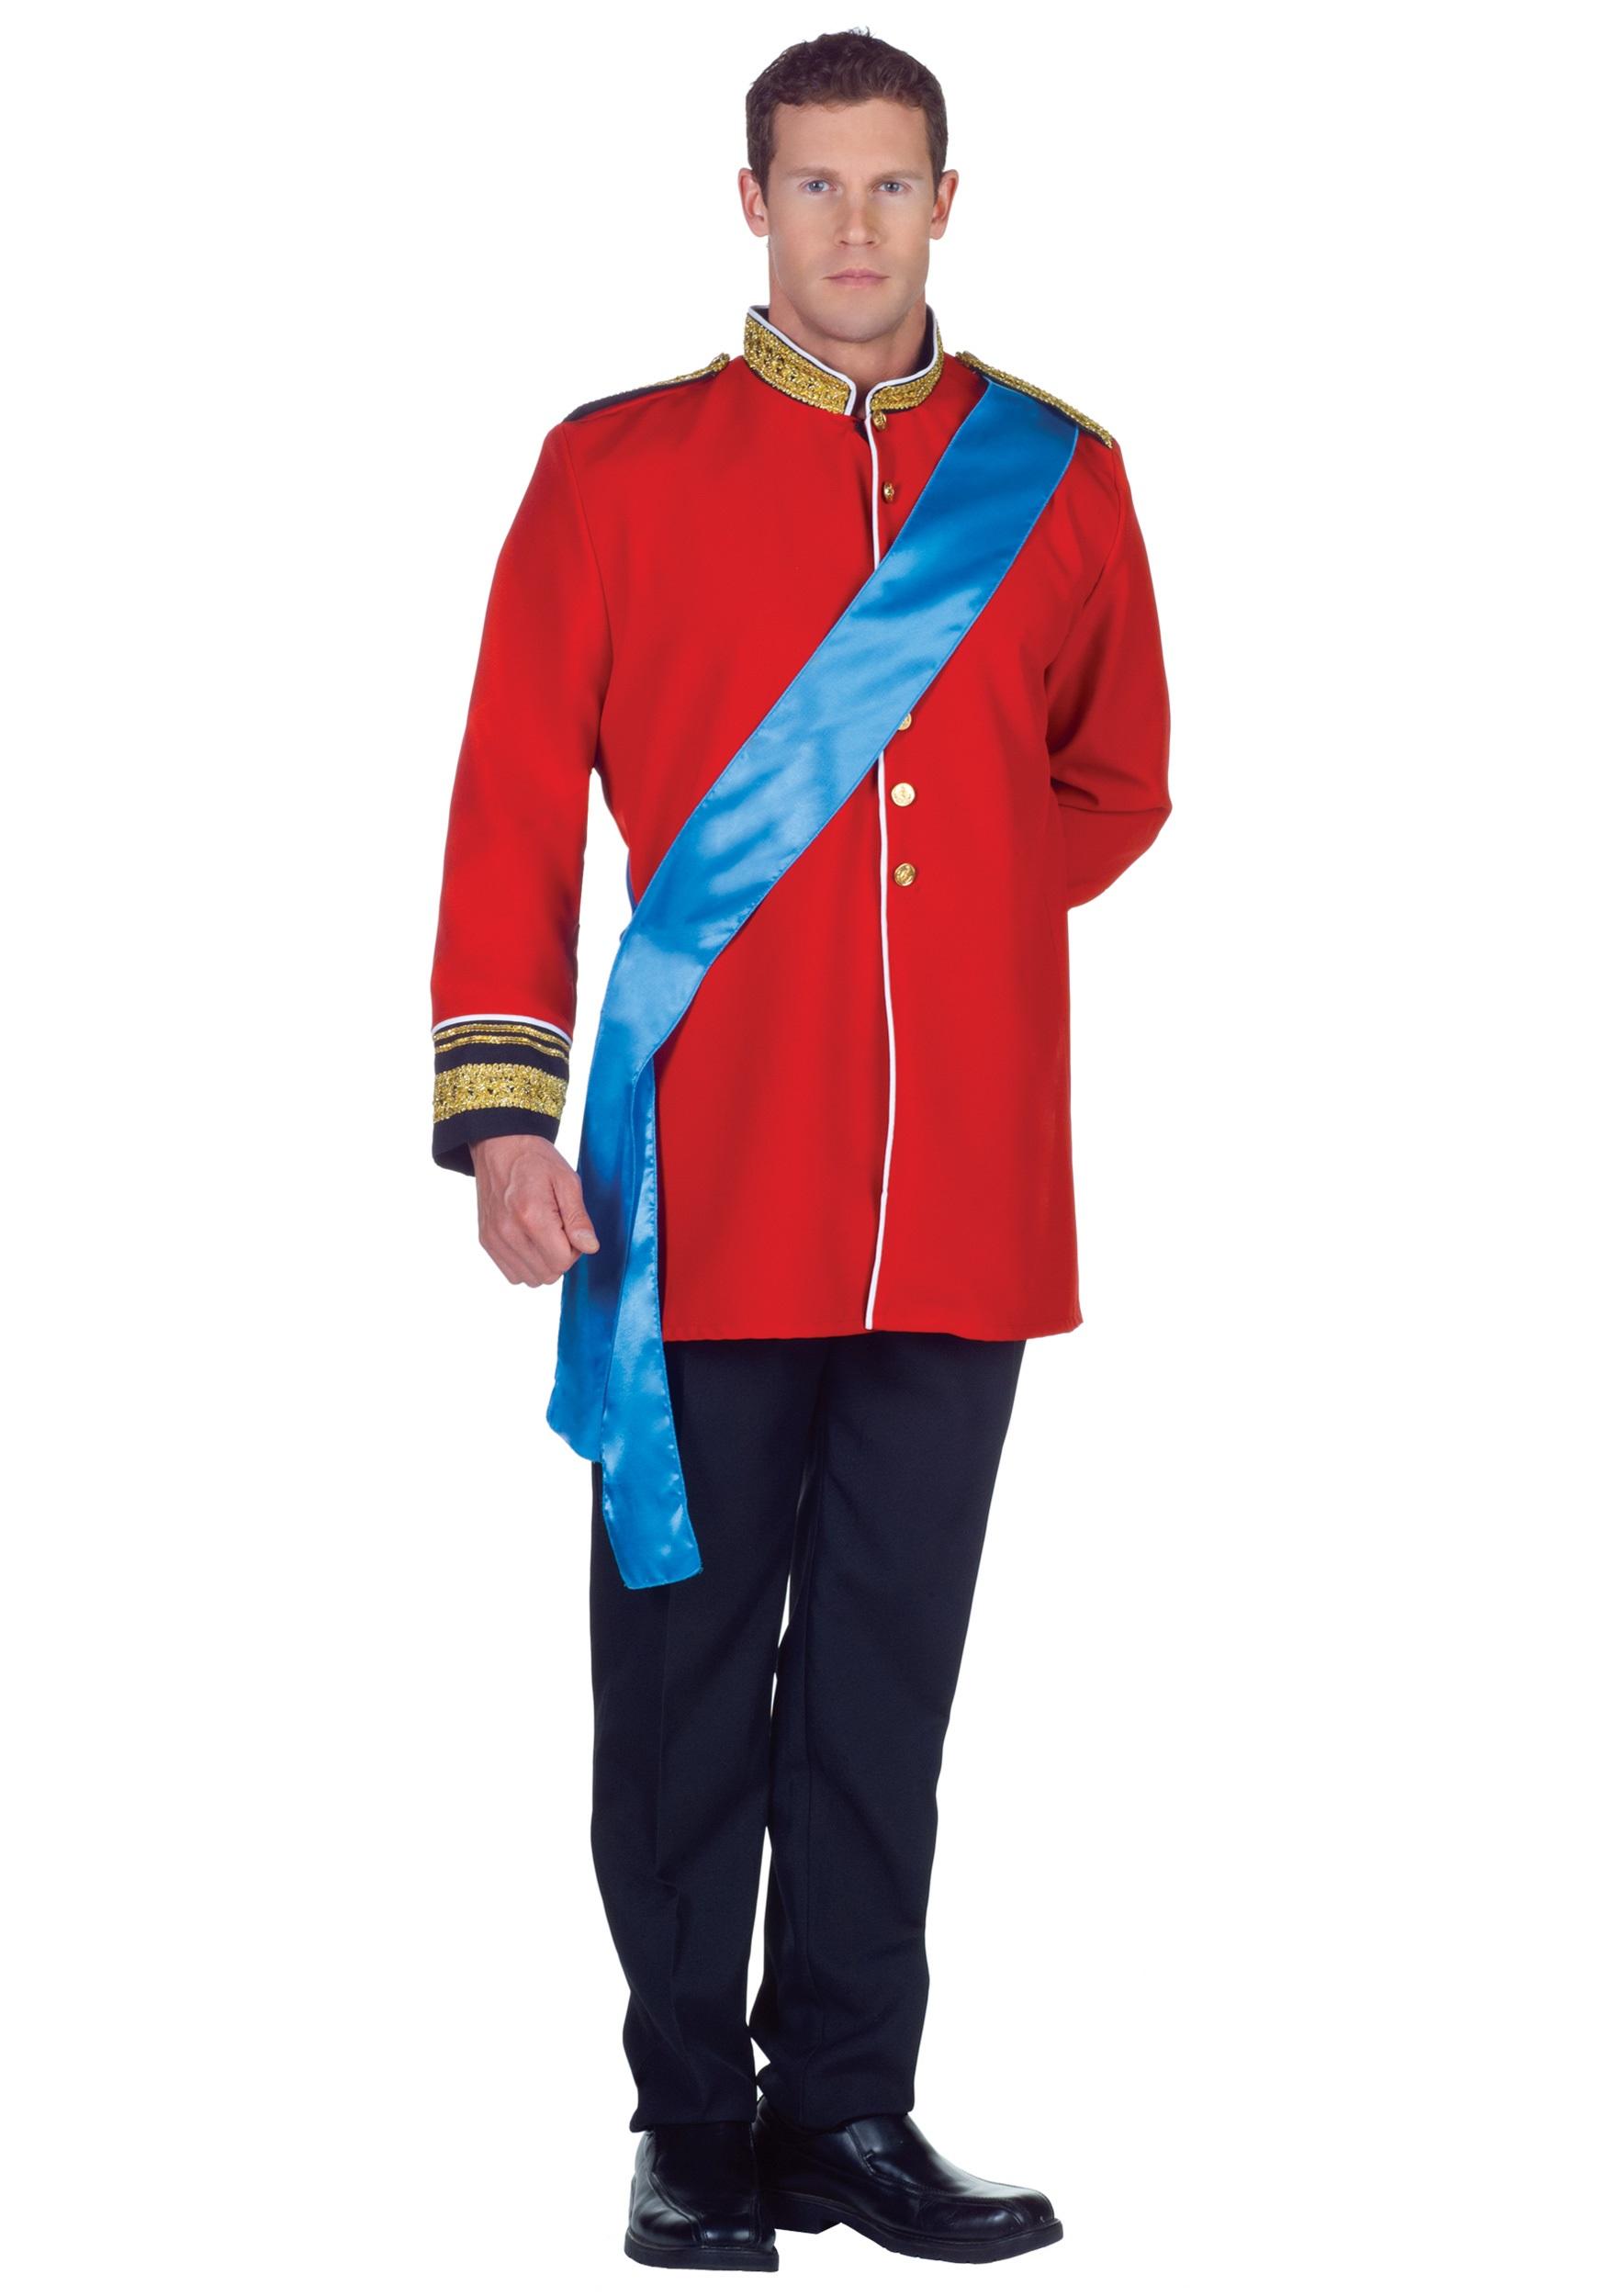 Royal prince costume solutioingenieria Gallery